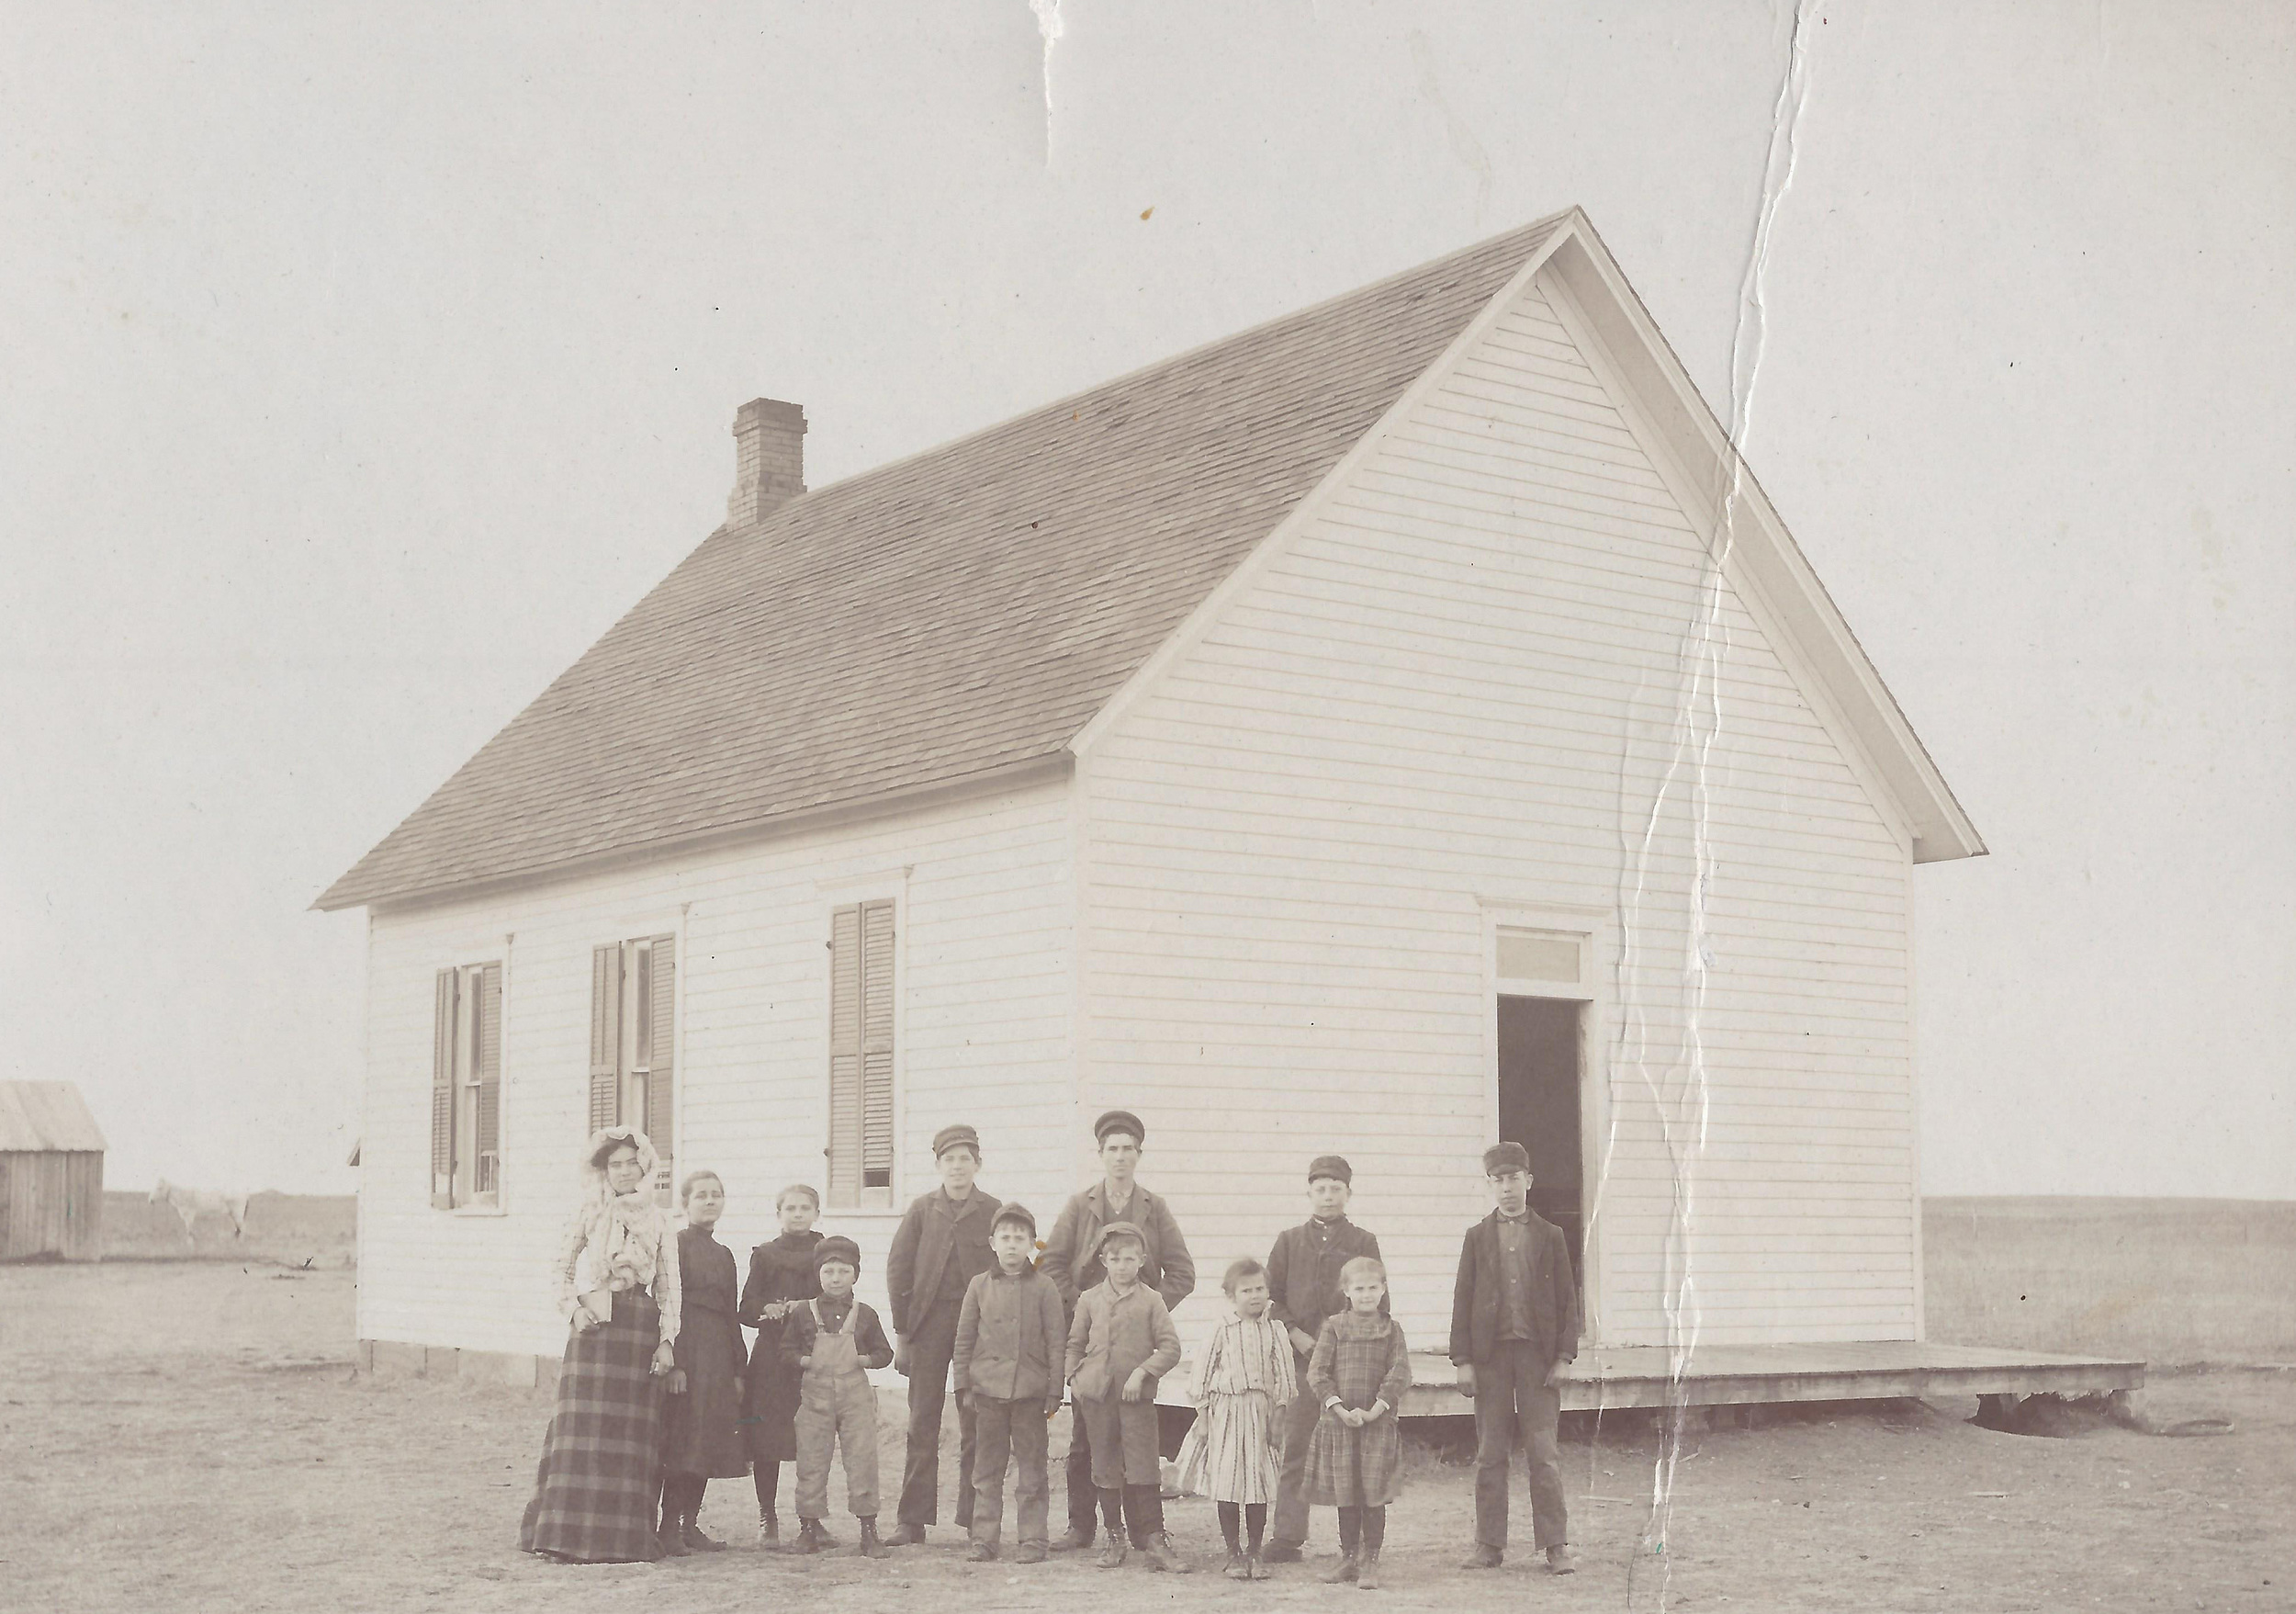 Santa Fe School - Teacher and pupils